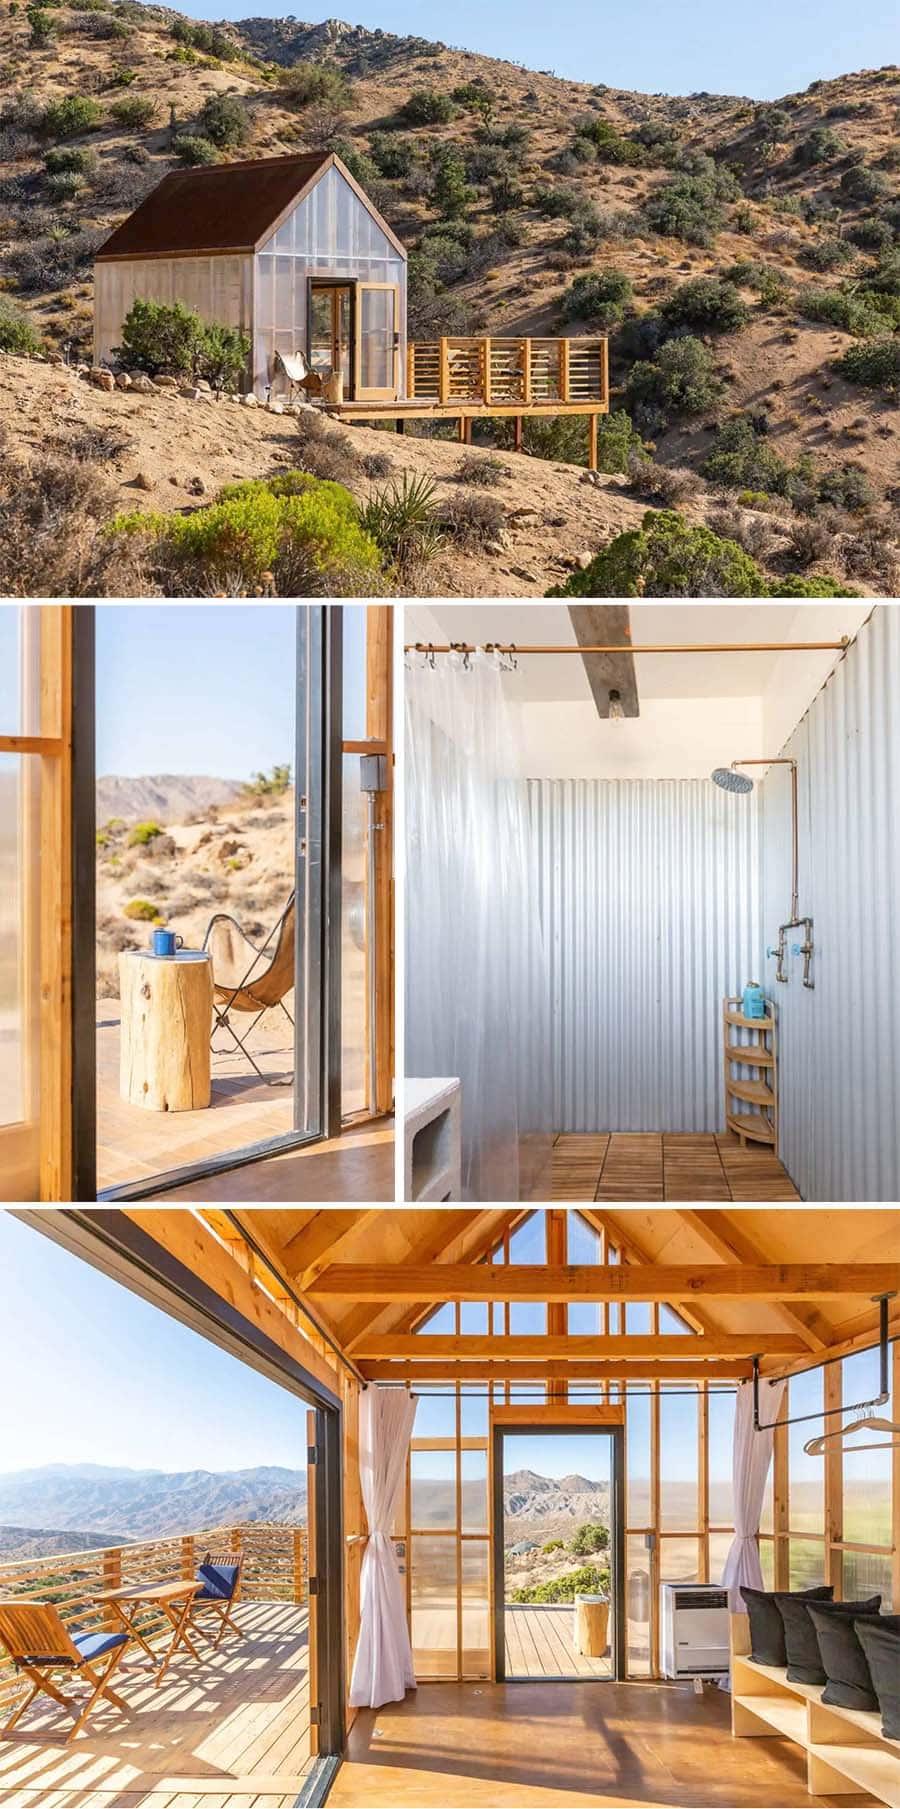 Morongo Valley California Airbnb cabin